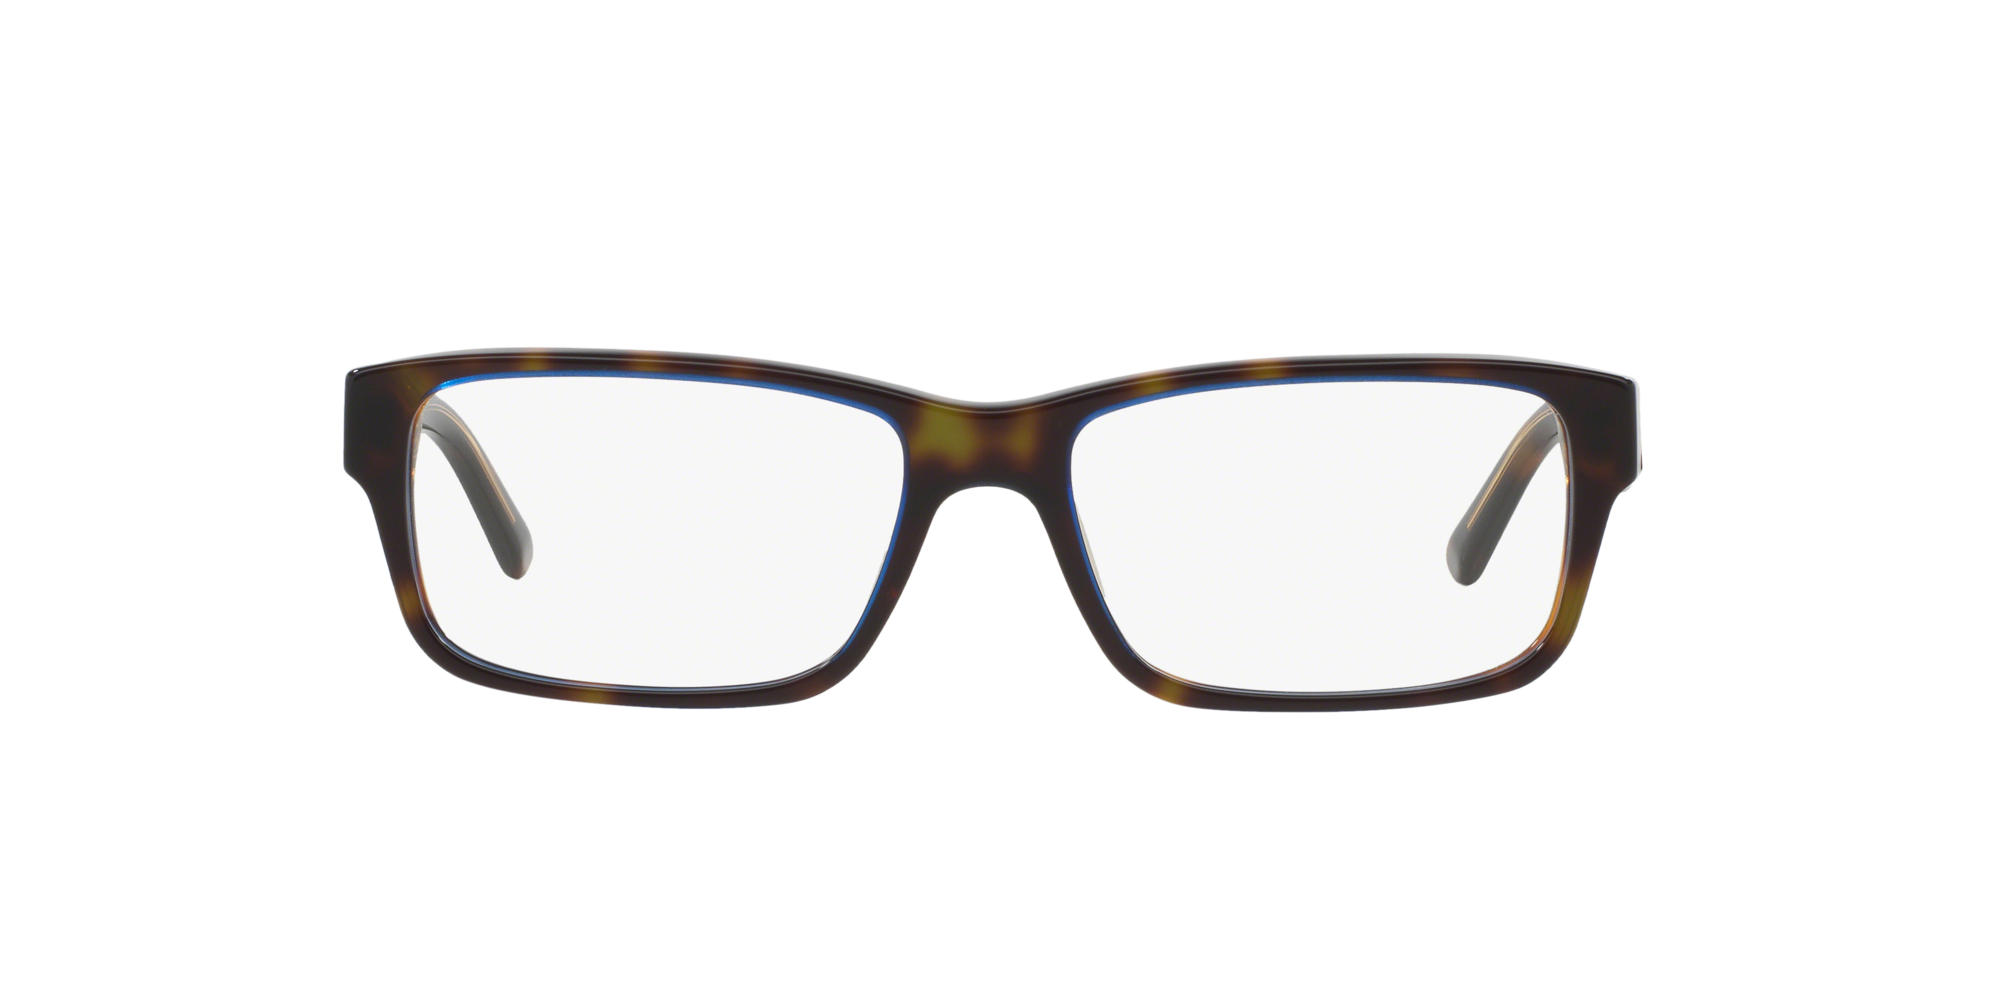 Image for PR 16MV from LensCrafters | Glasses, Prescription Glasses Online, Eyewear